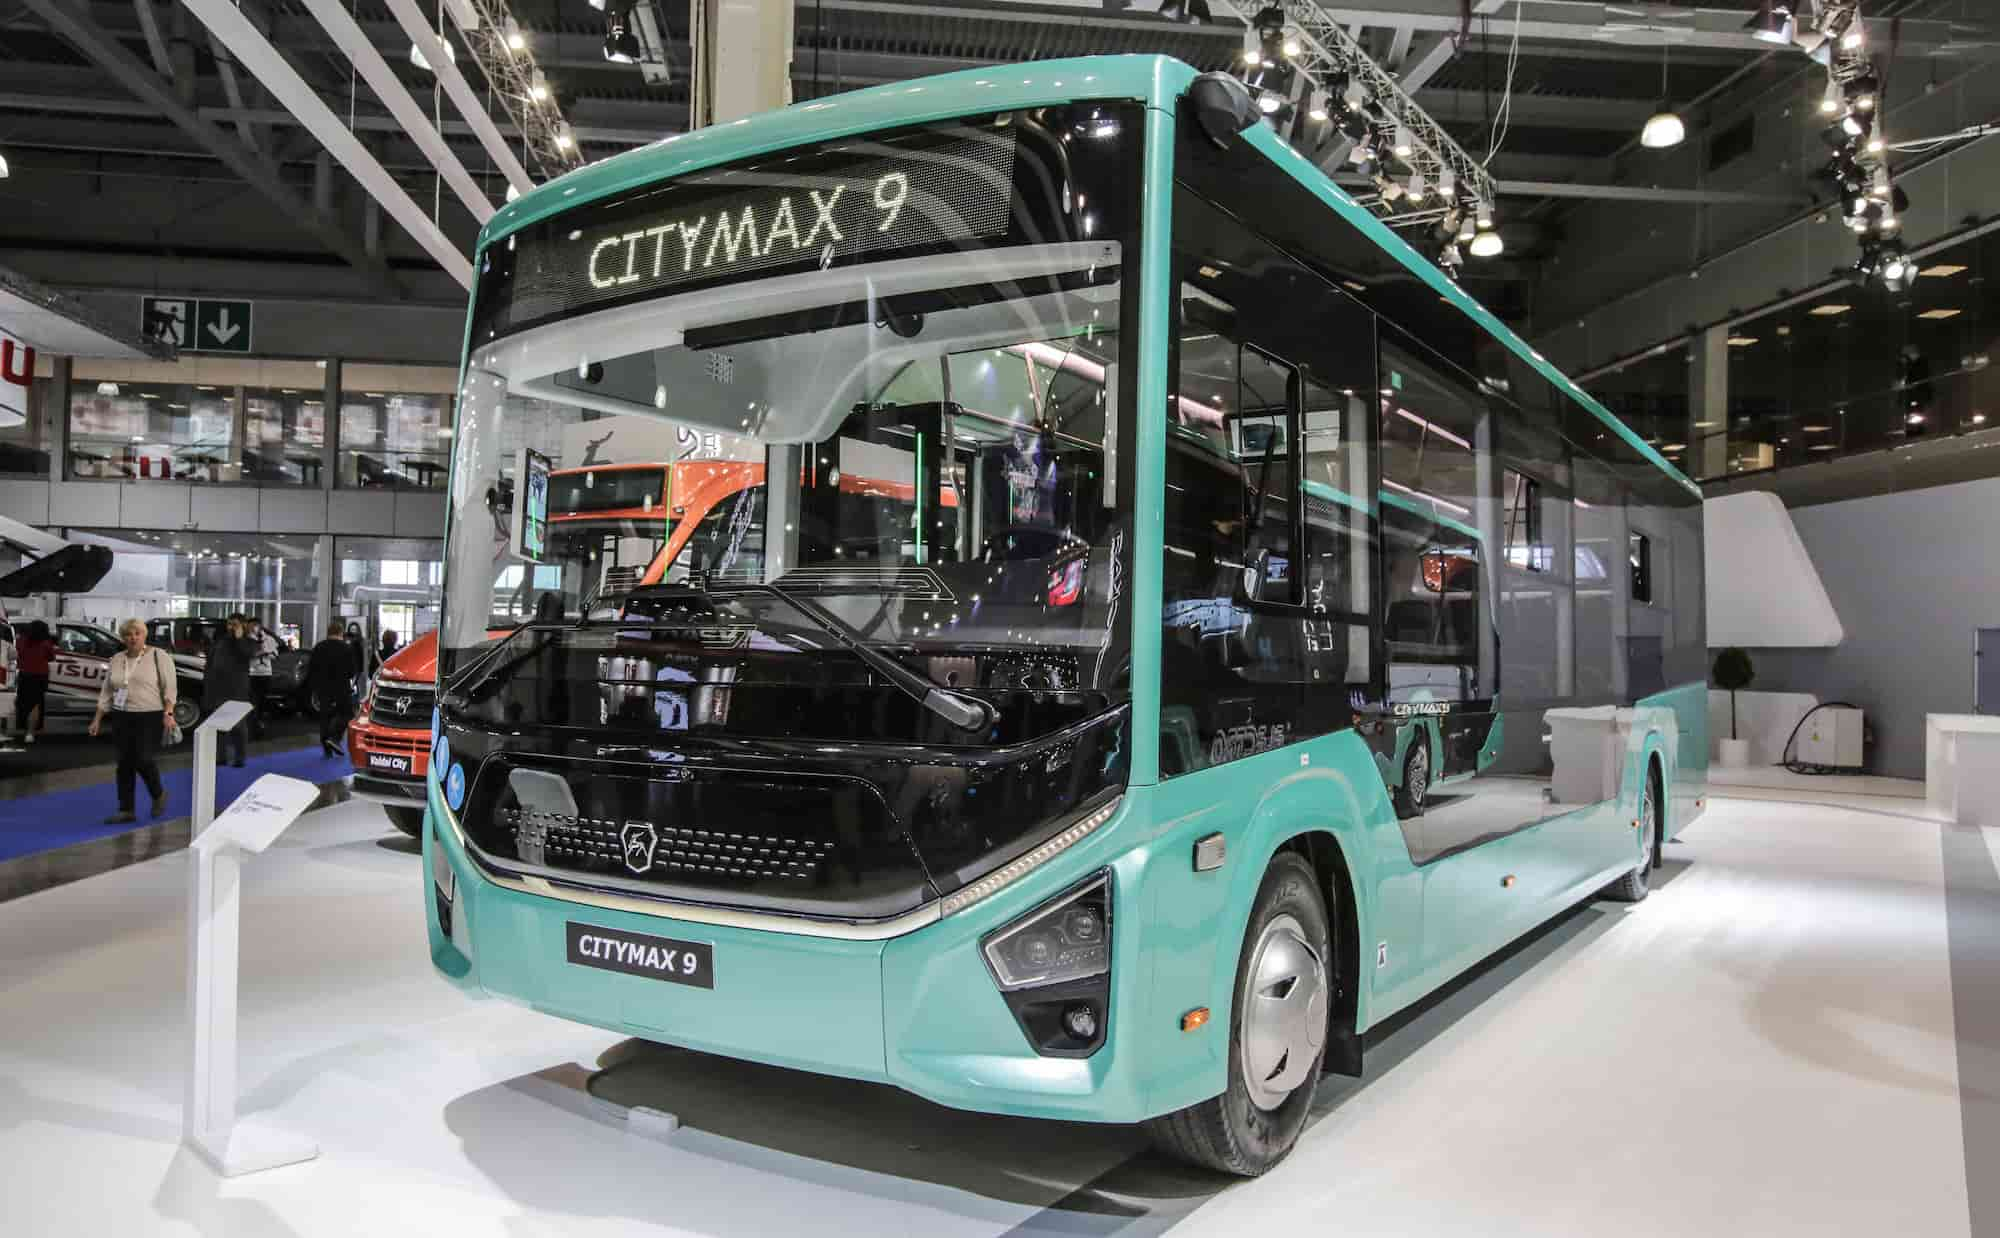 Автобус CITYMAX 9 2 1